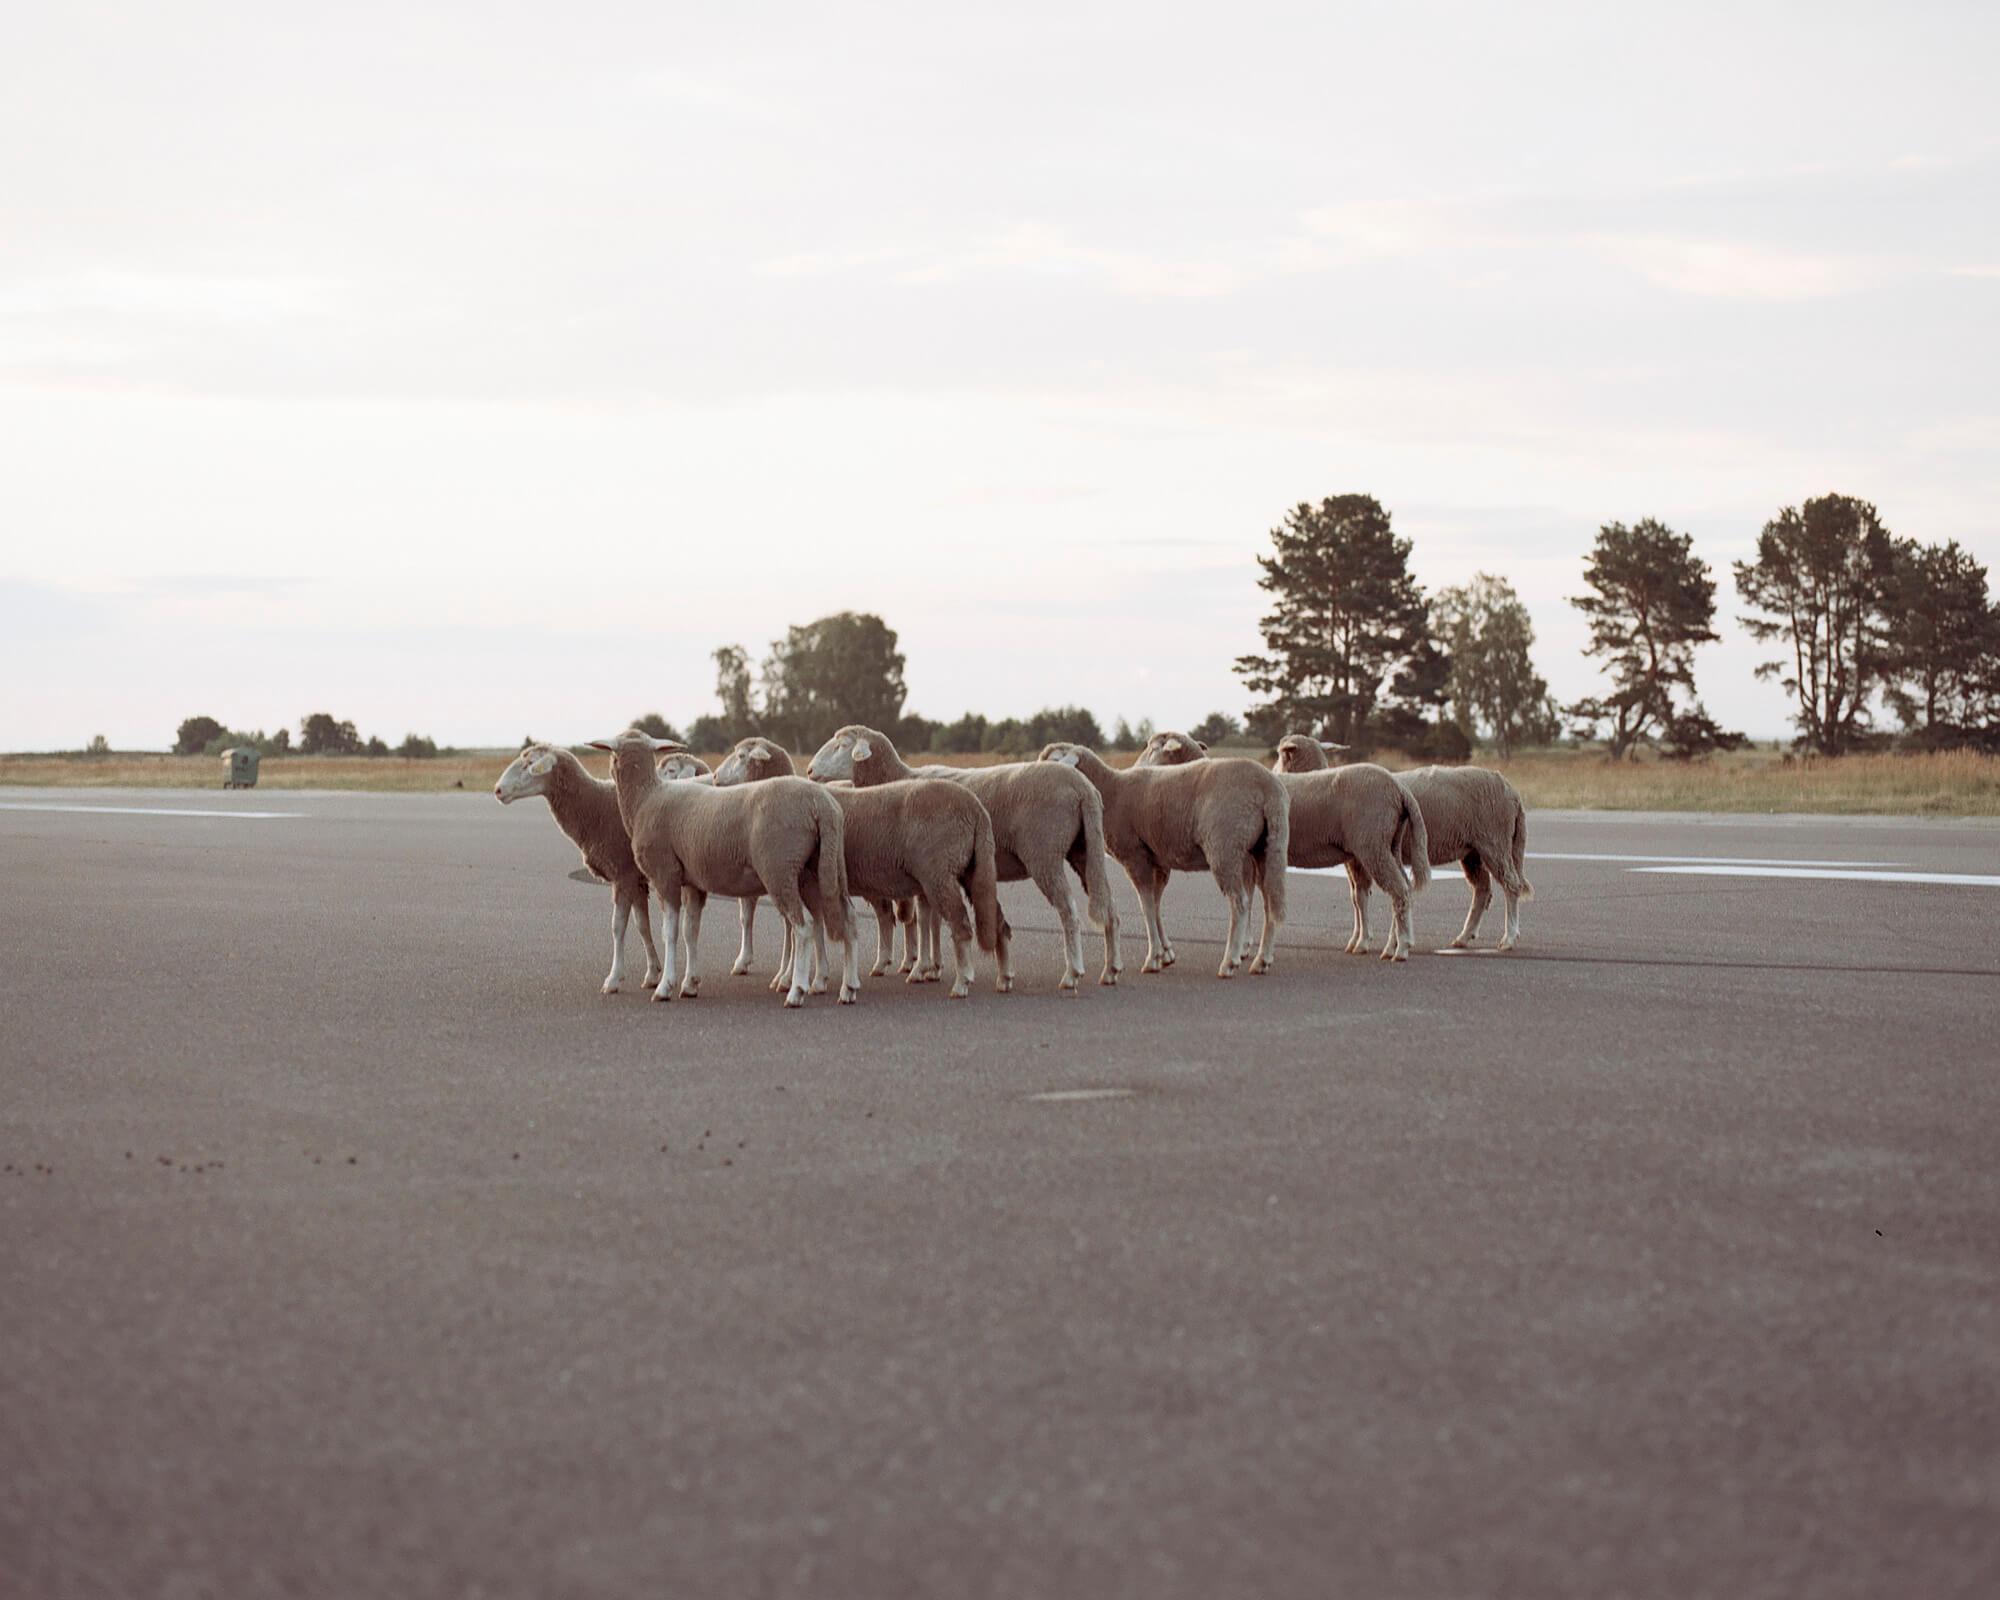 Tadas Kazakevicius - Between Two Shores sheep in the road